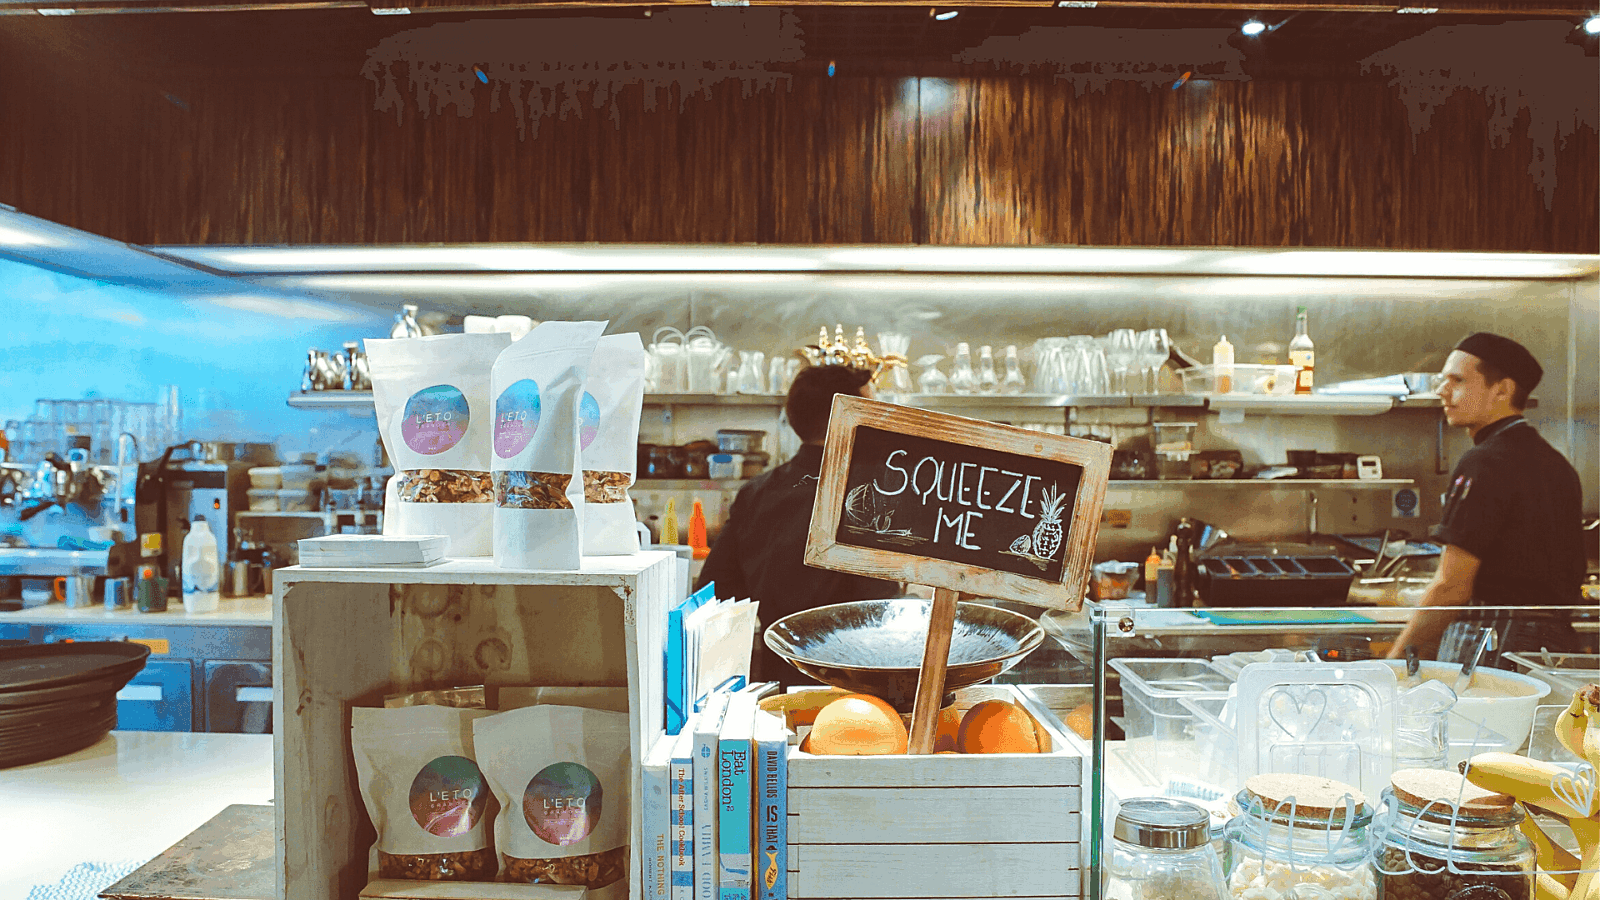 Restaurant Inventory Costing Methods FIFO vs LIFO vs WAC Hero Image